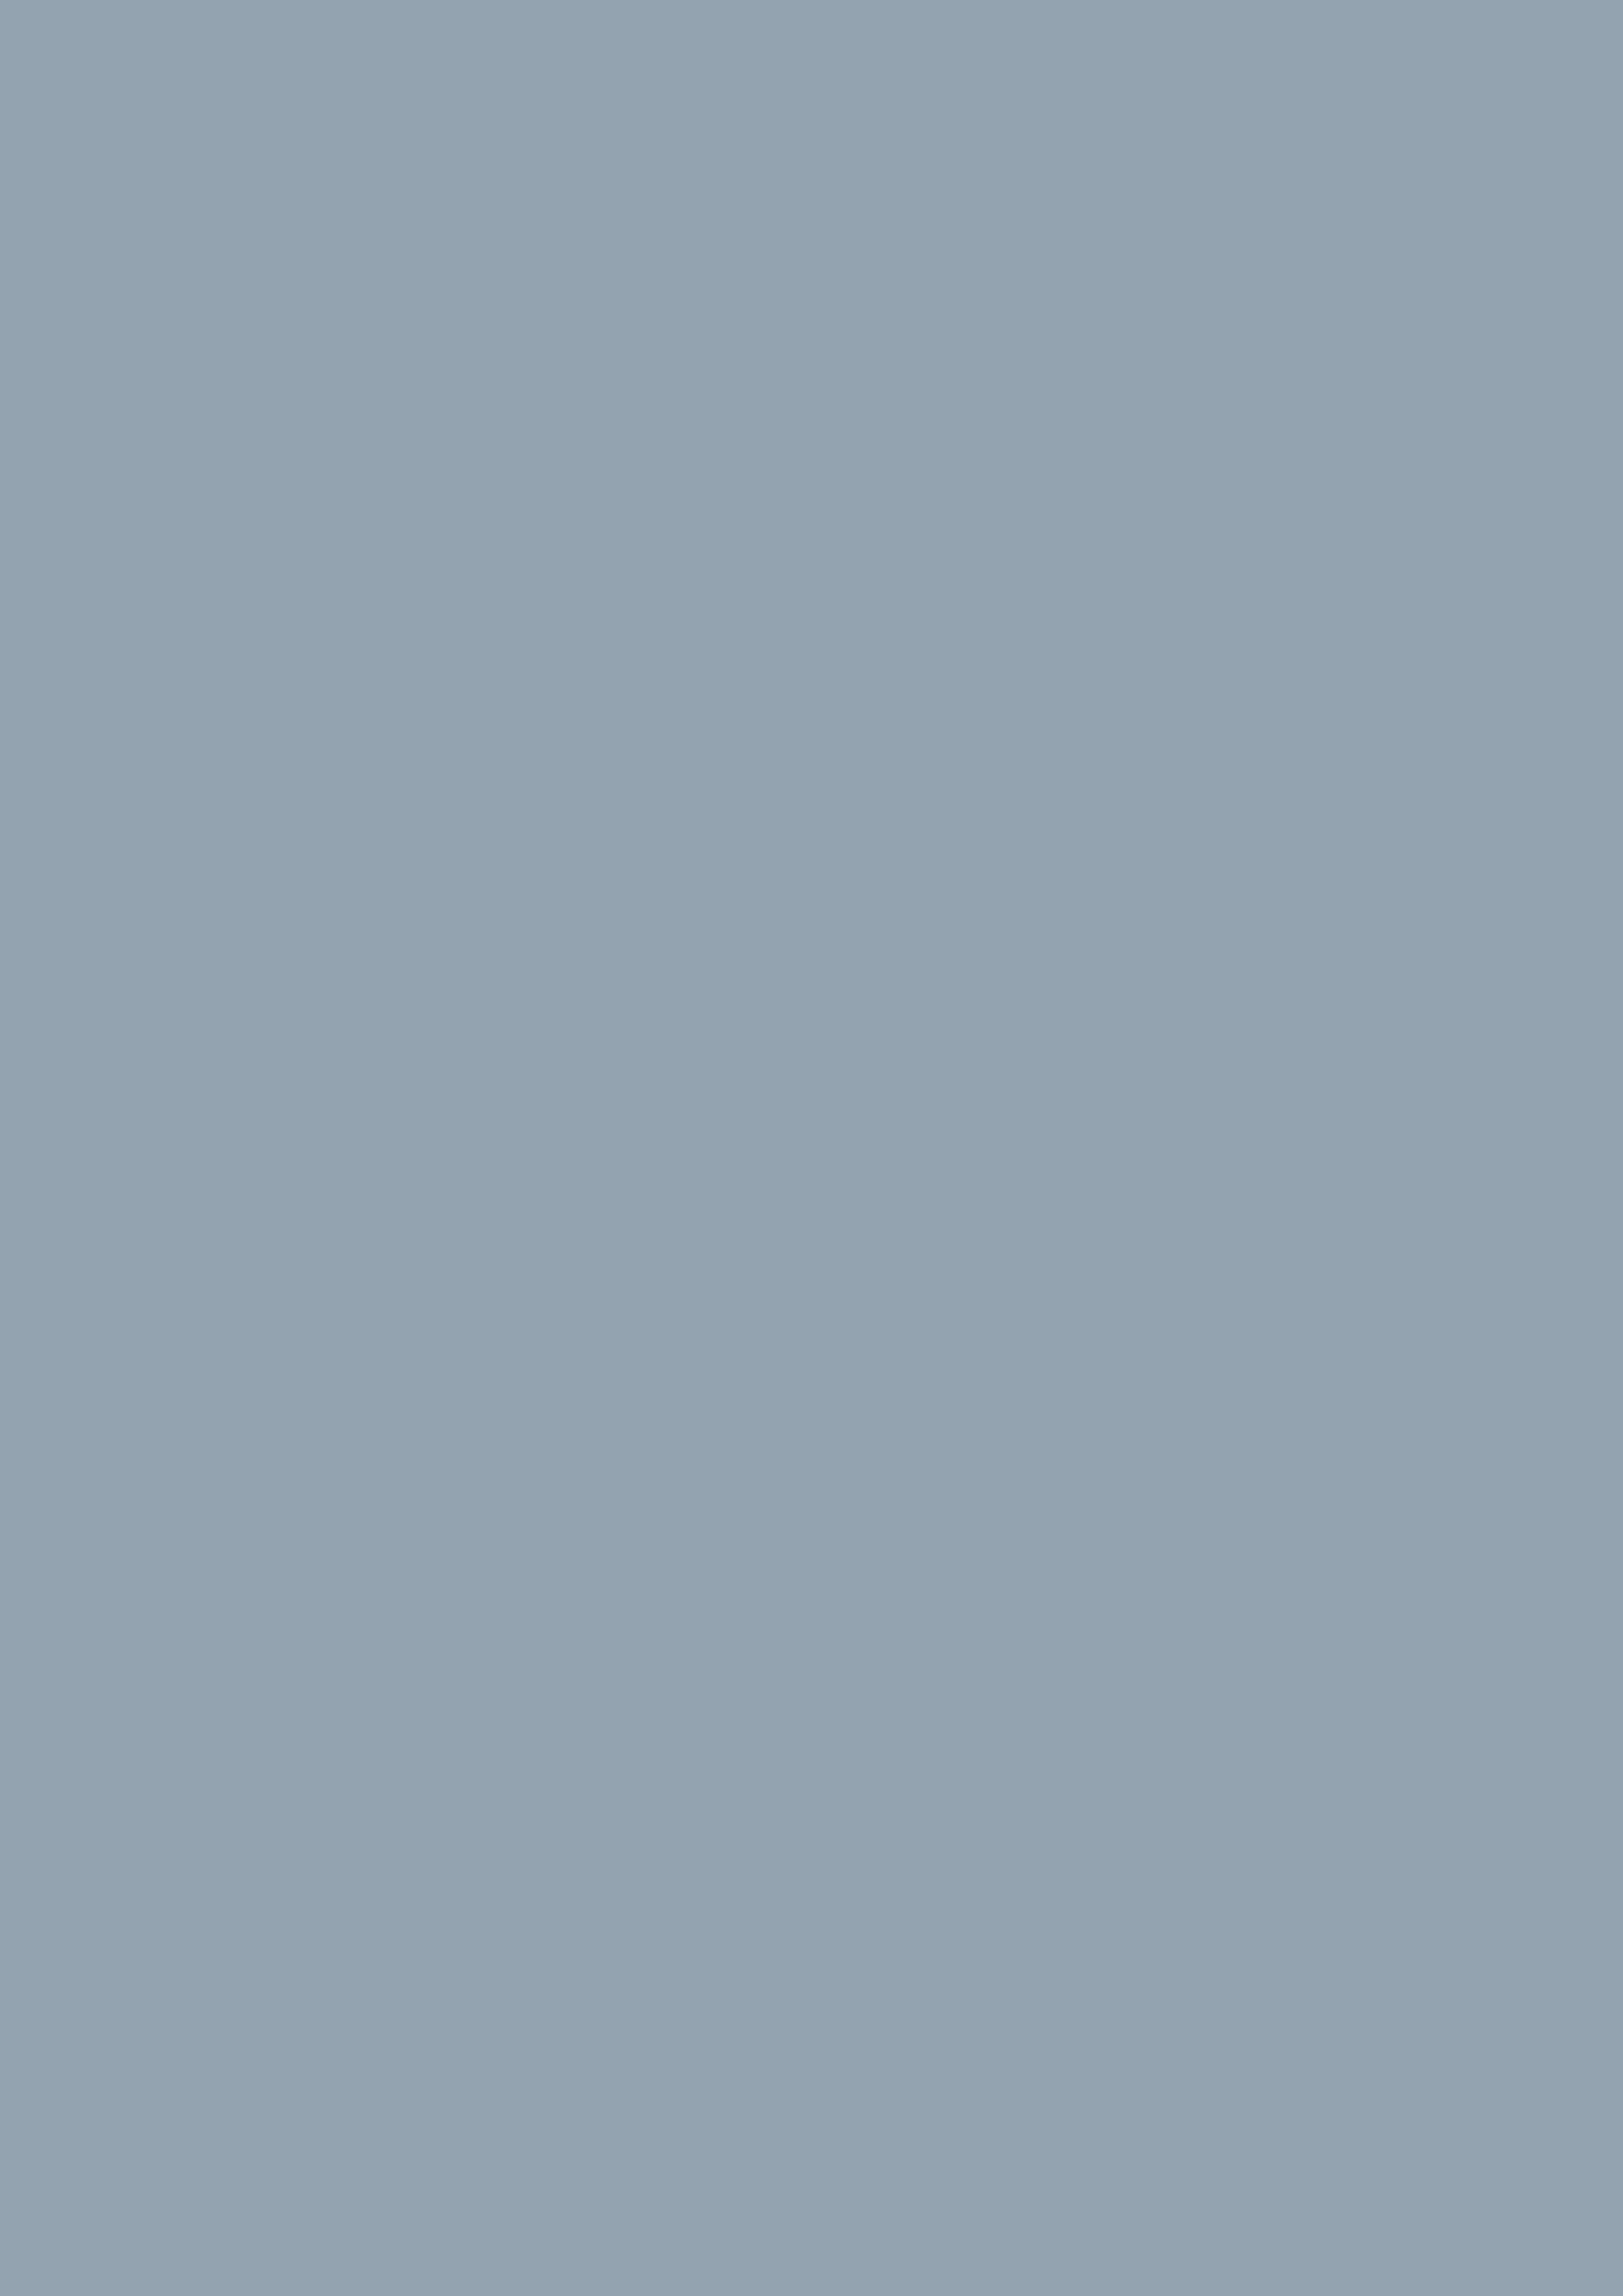 2480x3508 Cadet Grey Solid Color Background